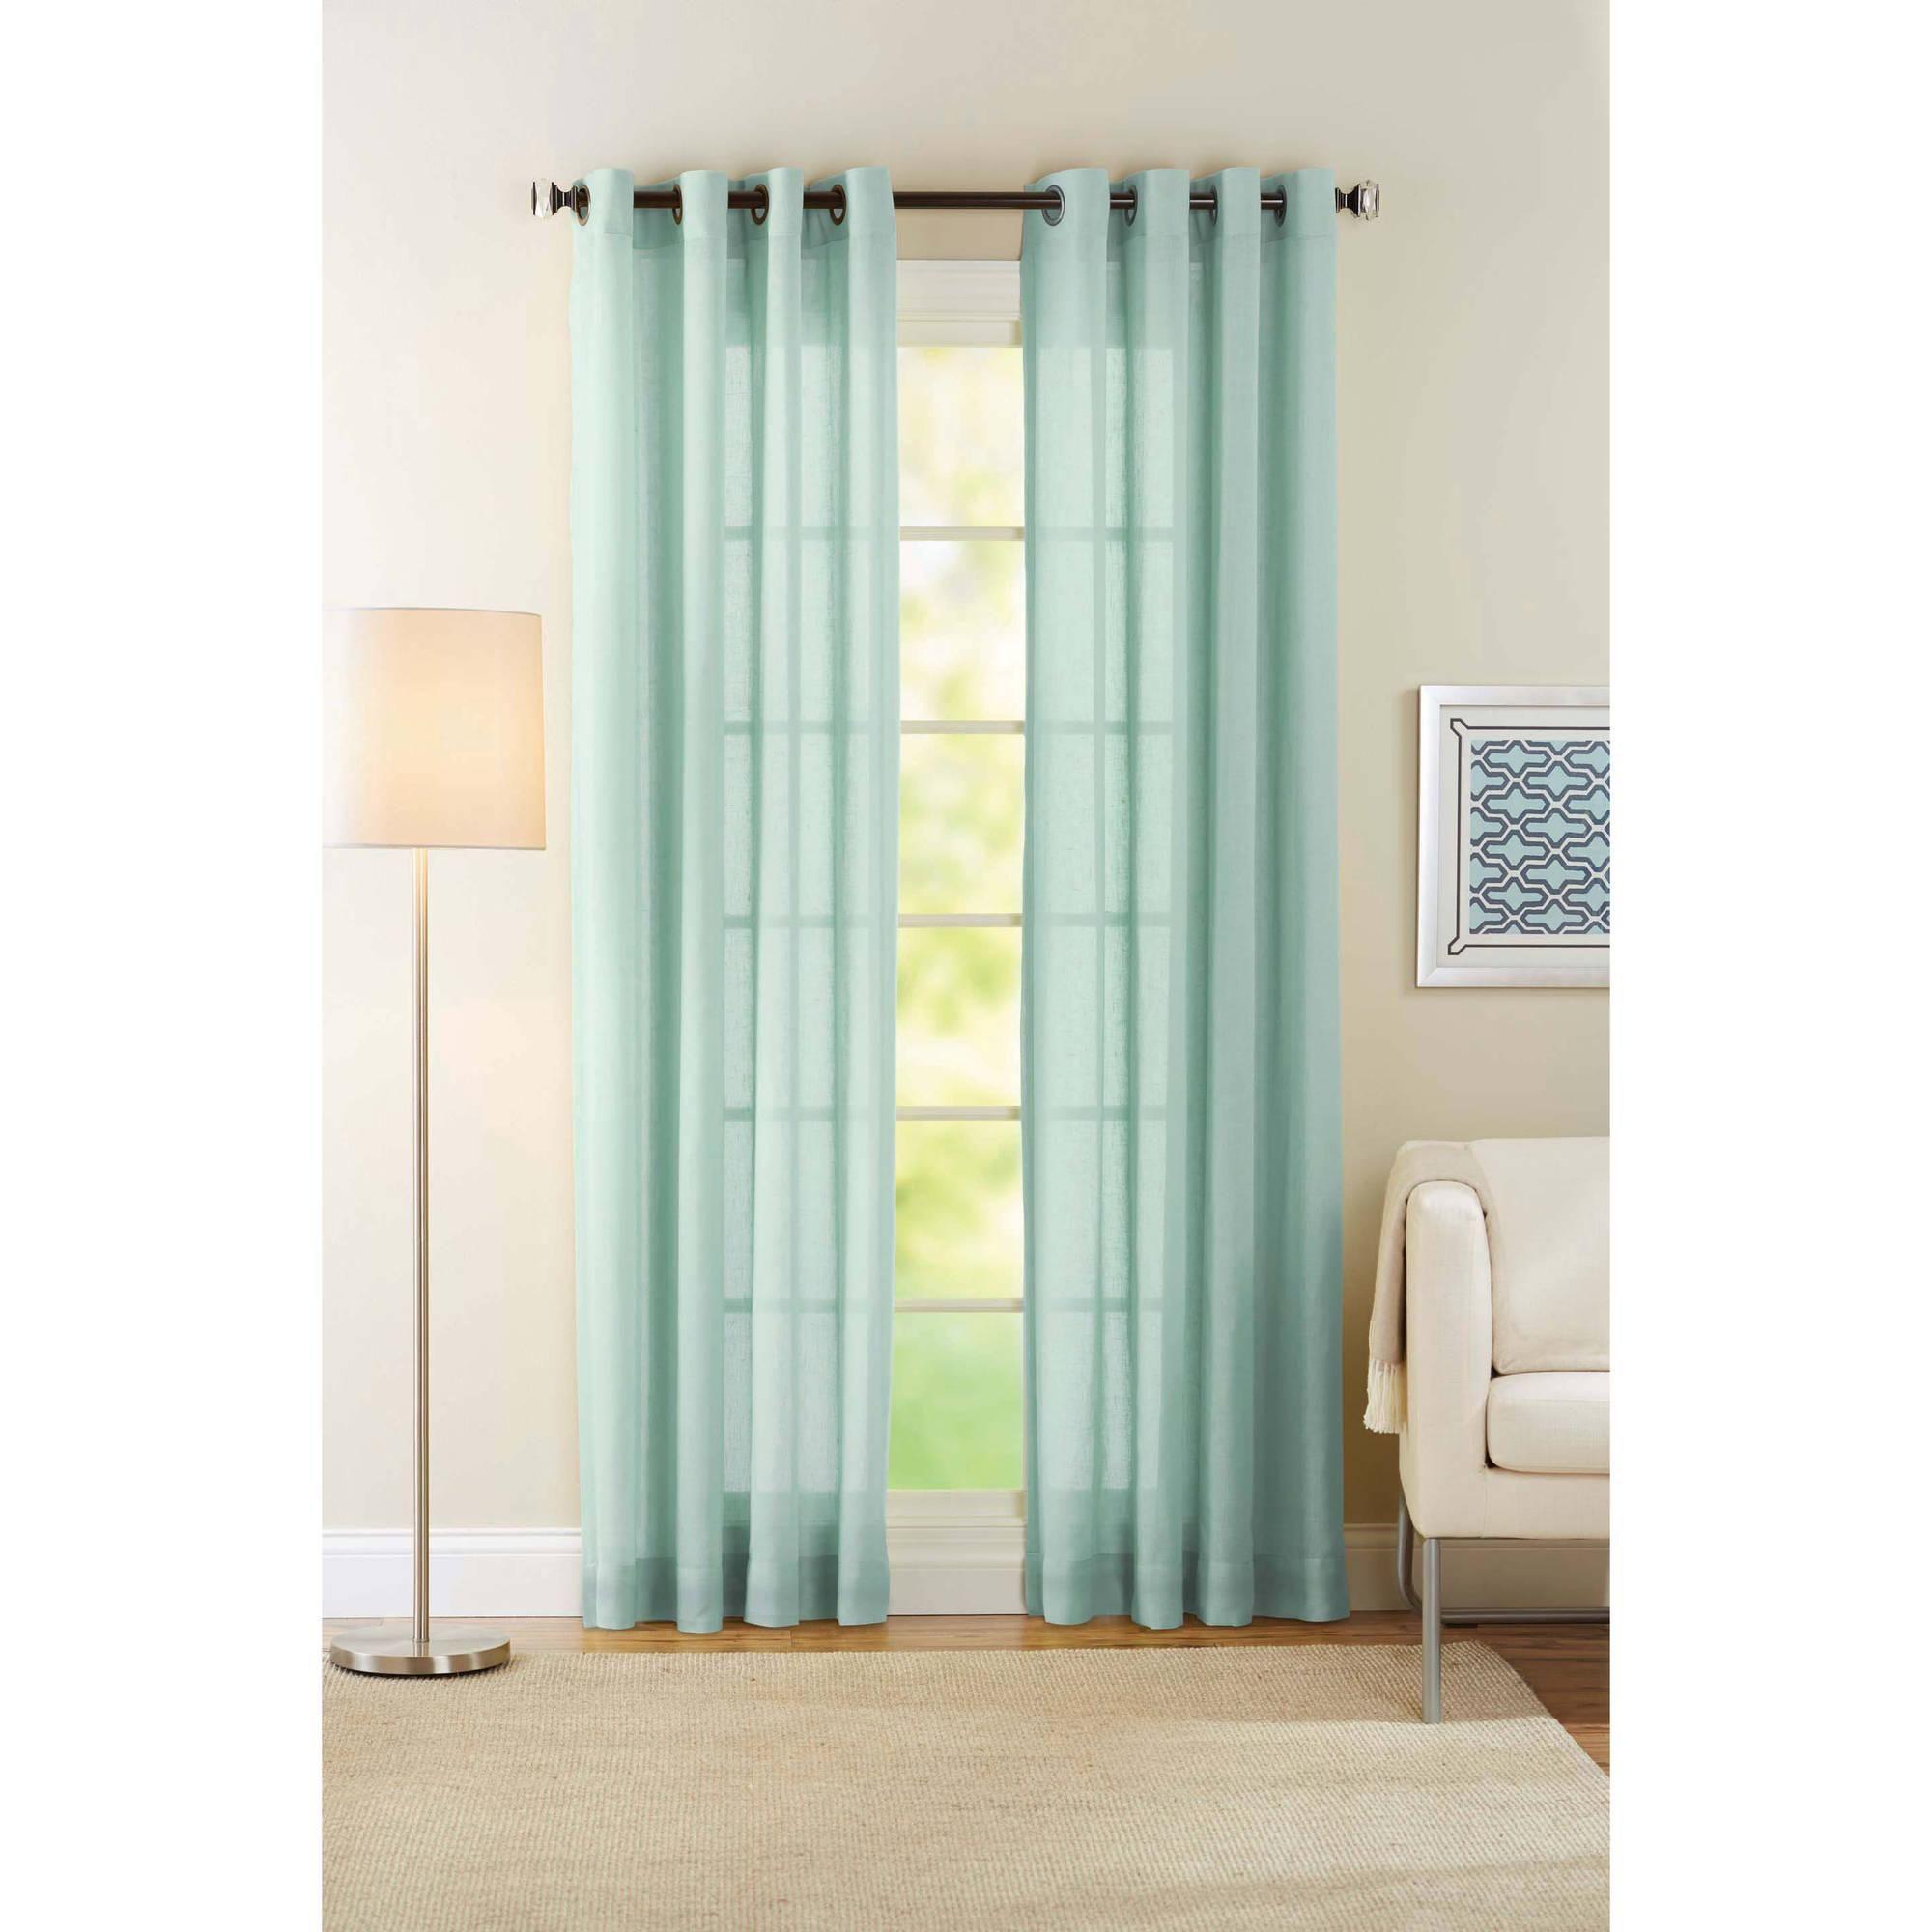 Turquoise Curtains Curtains Drapes Walmart Com Turquoise Curtains Green Sheer Curtains Sheer Curtain Panels